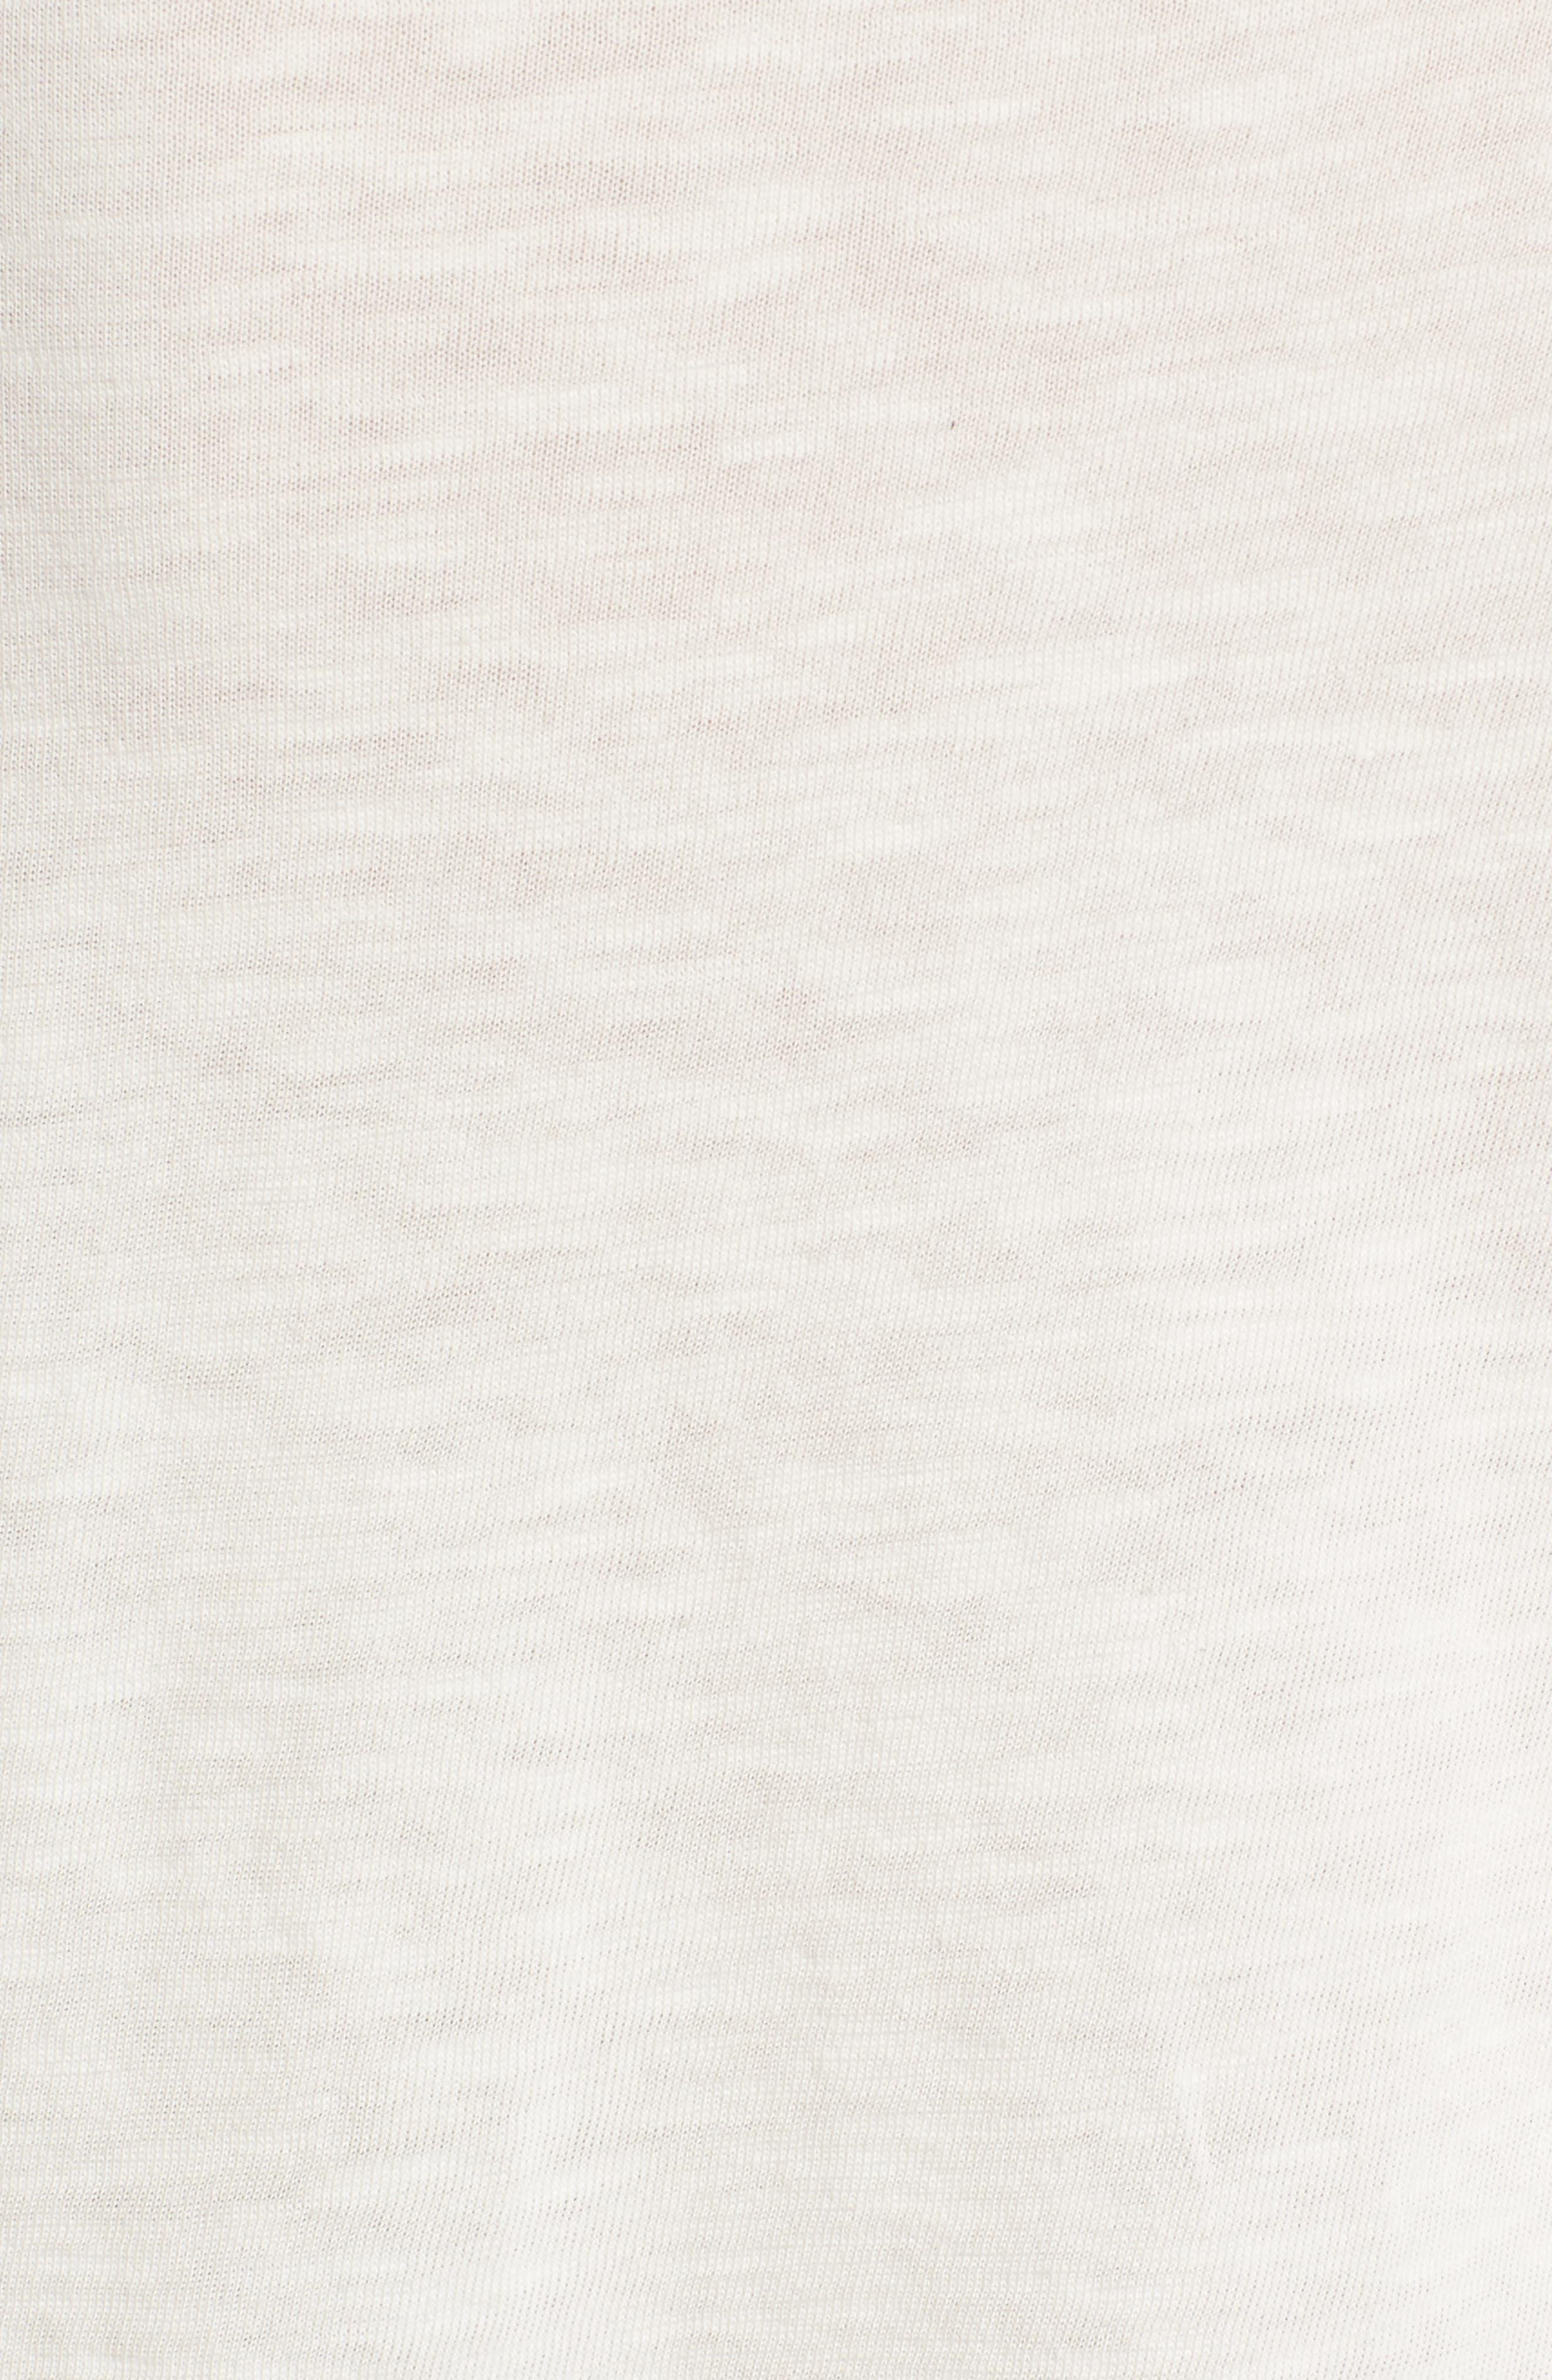 Tie Sleeve Slub Cotton Tee,                             Alternate thumbnail 5, color,                             Off White